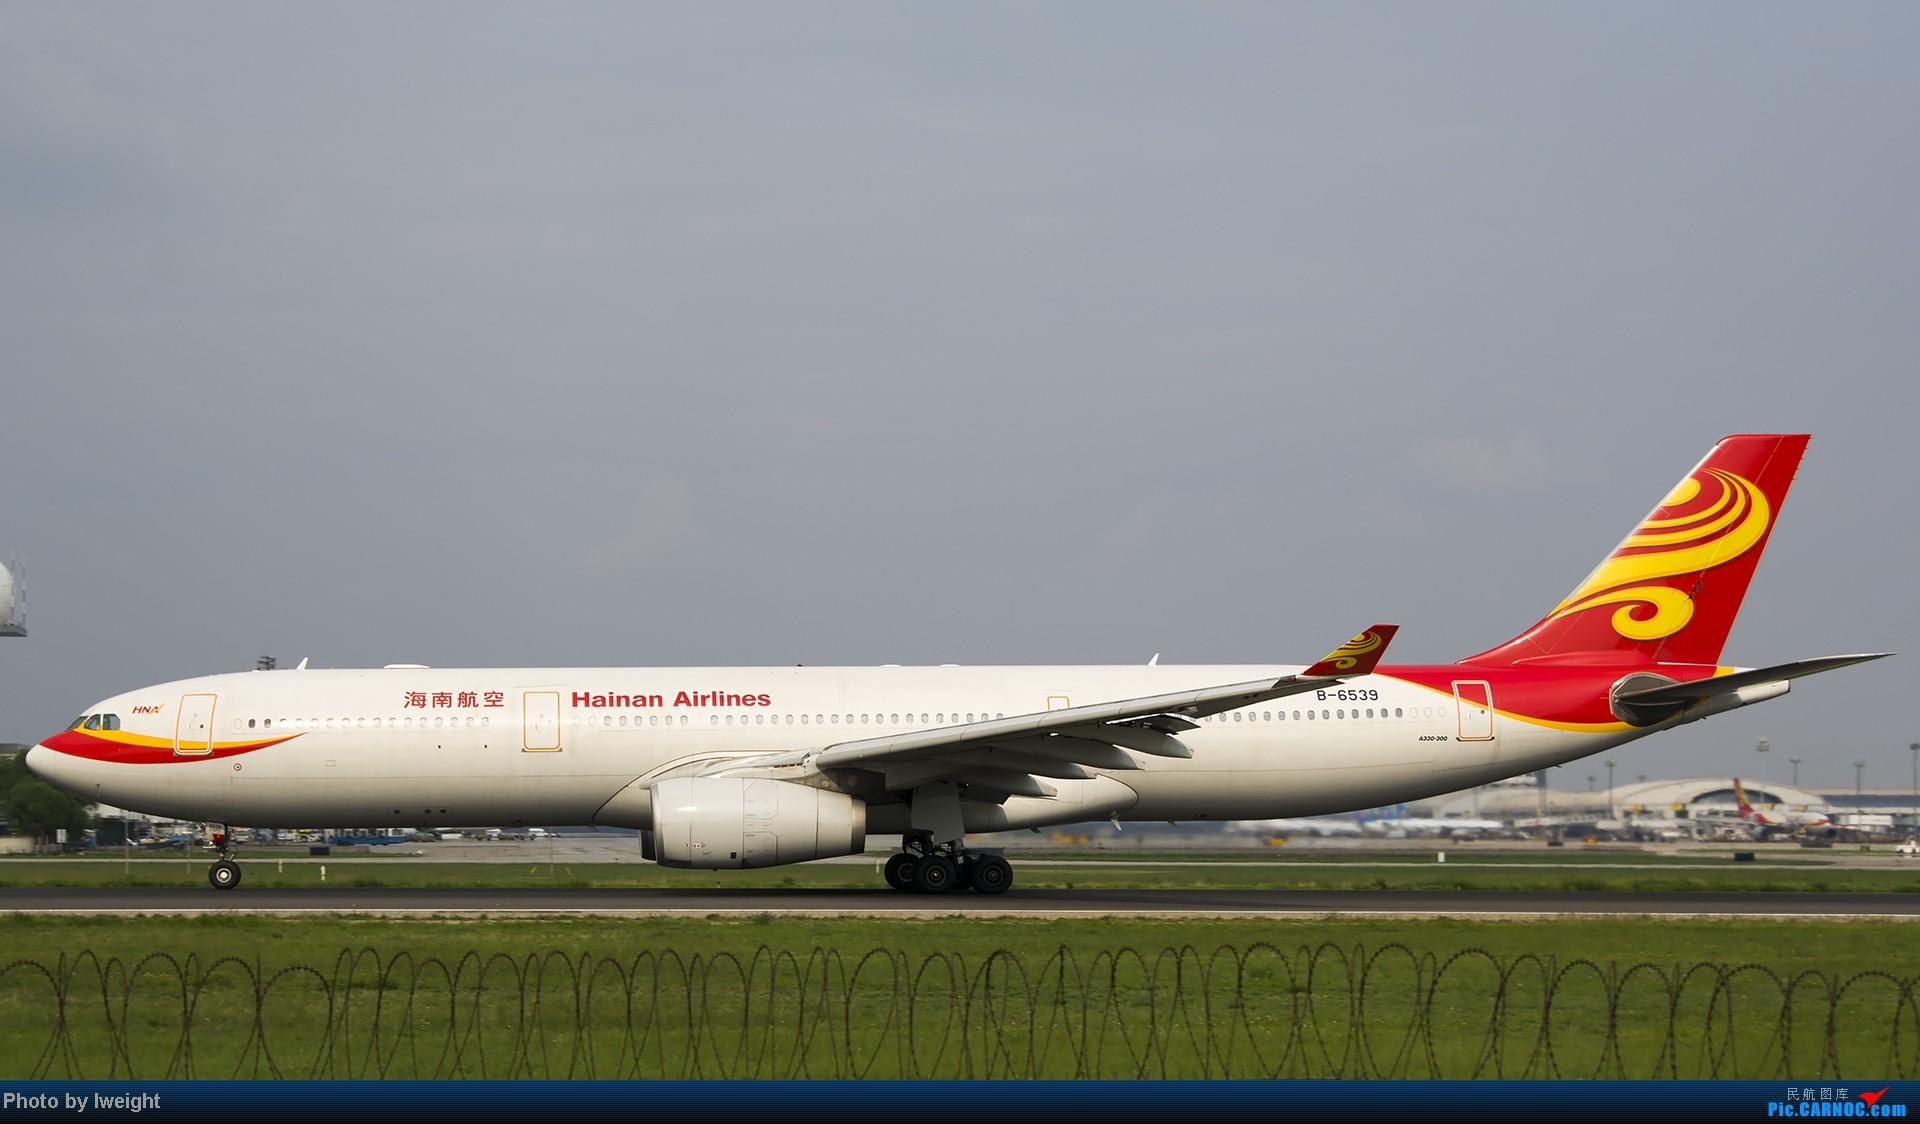 Re:[原创]20号下午机场随拍(国内最新的787-8) AIRBUS A330-300 B-6539 中国北京首都机场